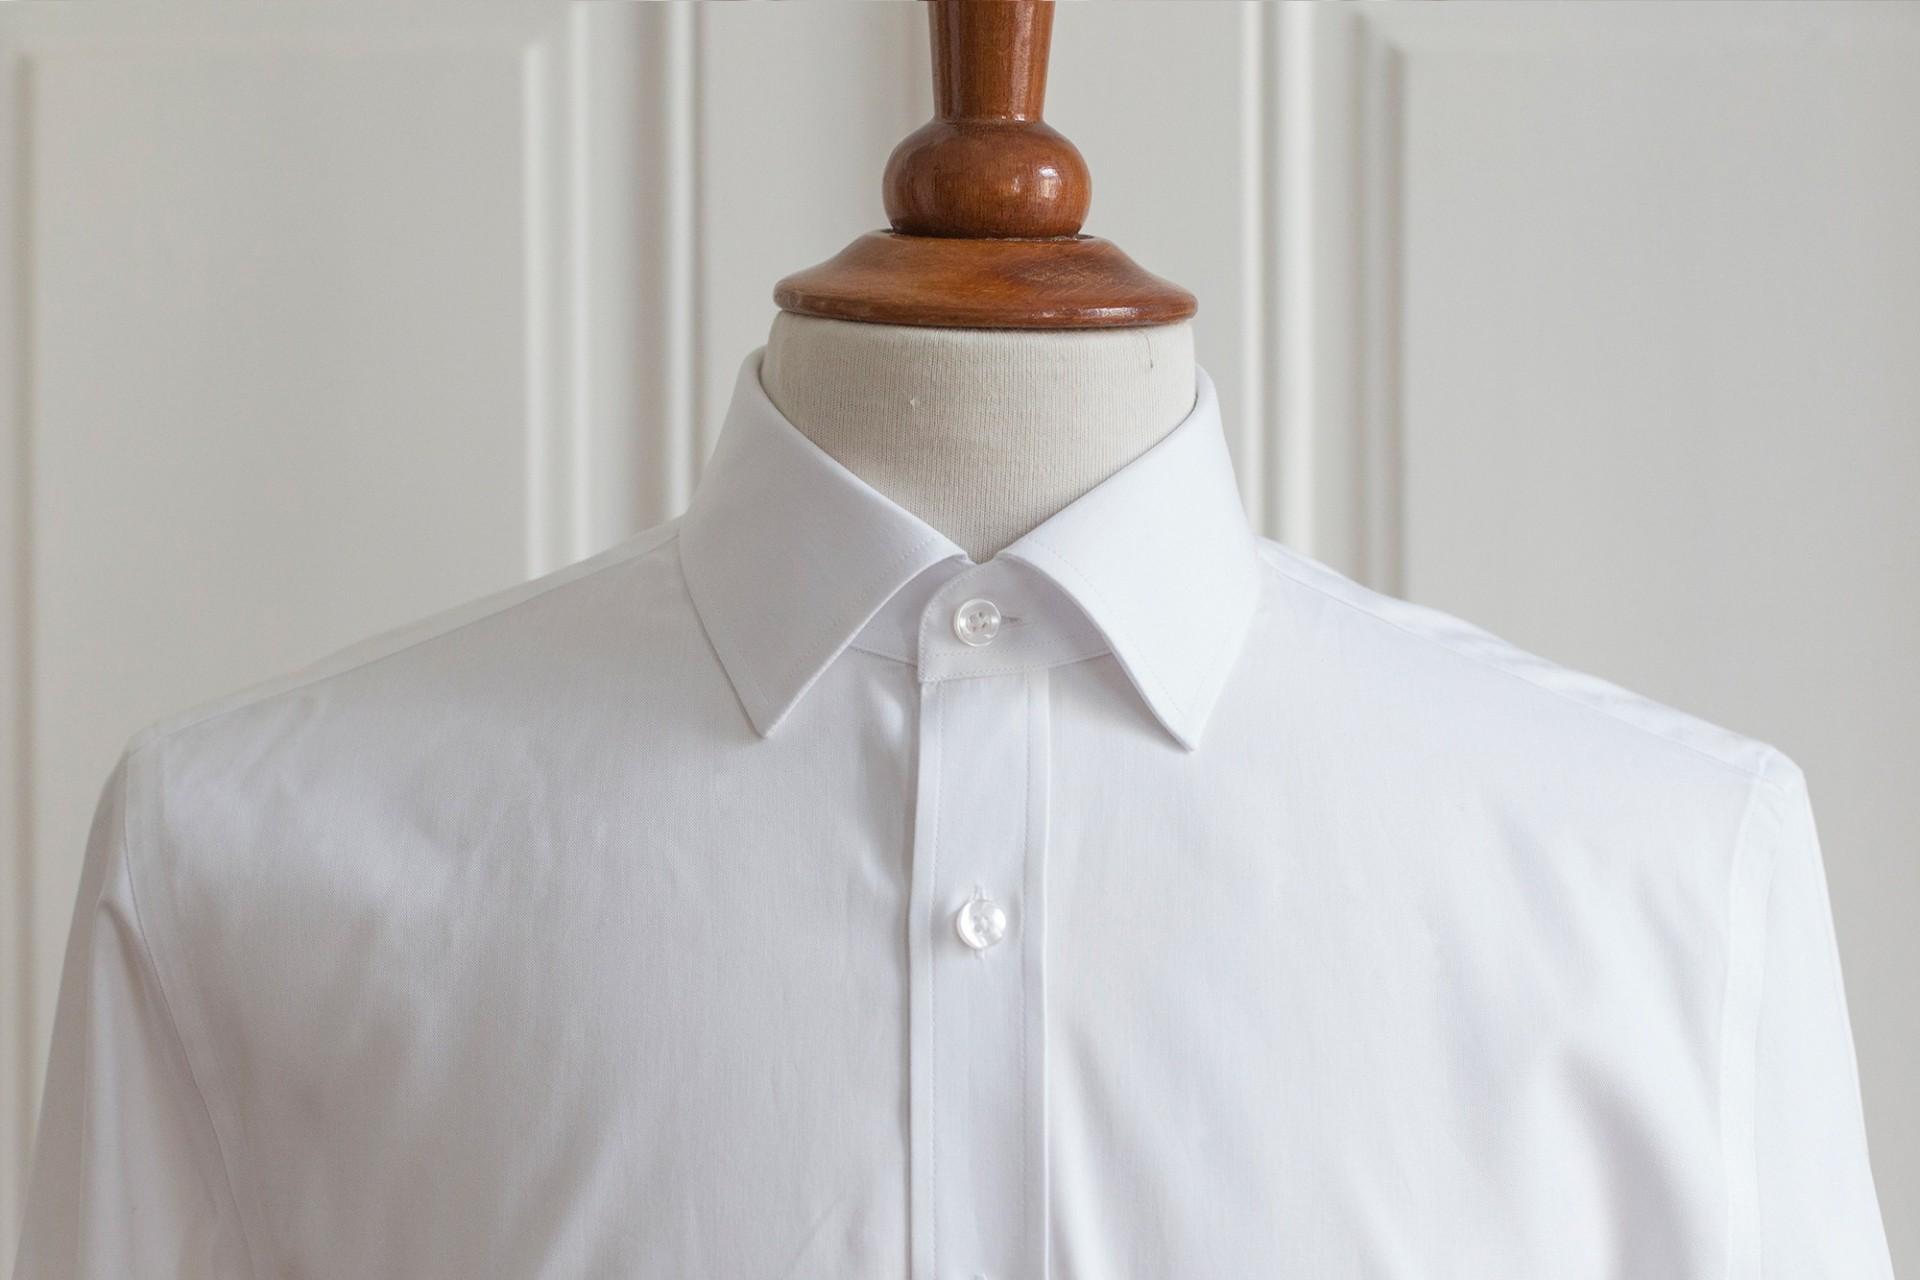 1920s collared shirt